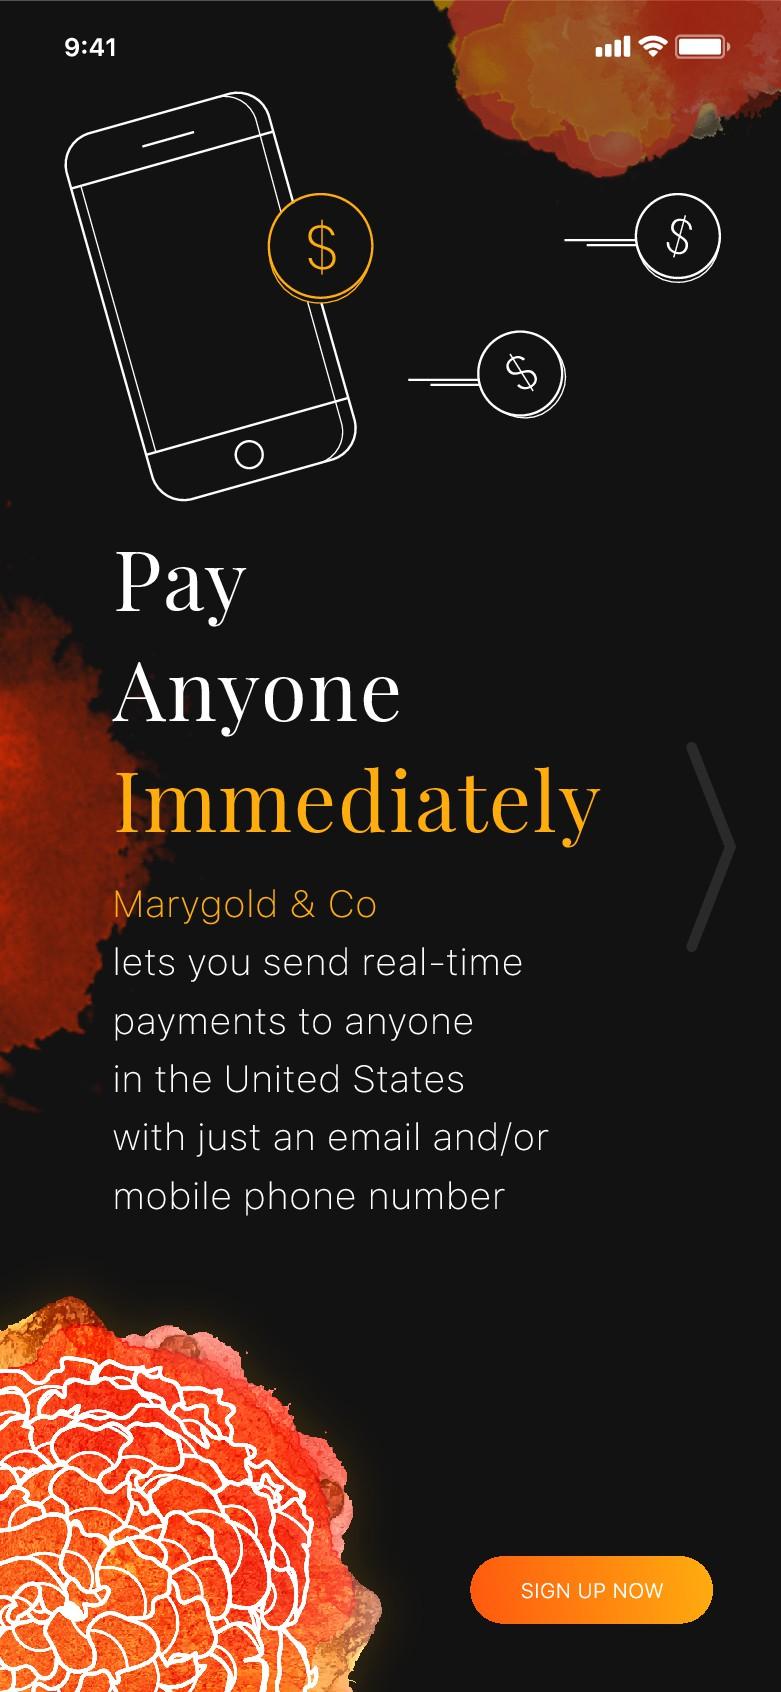 Upscale new cool fintech wait list app